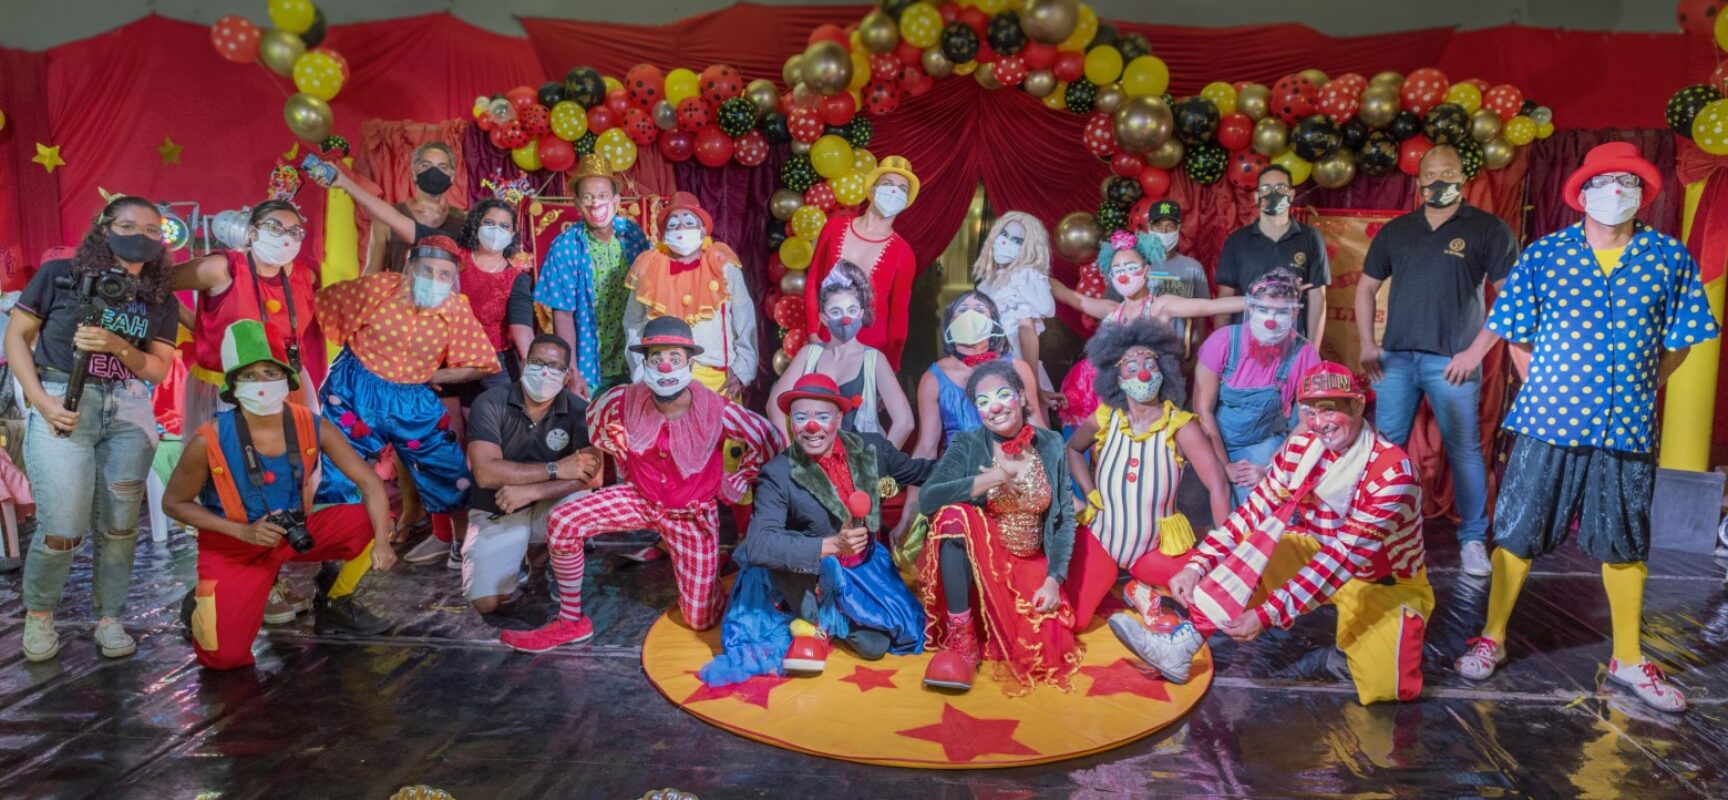 Festival Palhasseata de Ilhéus celebrou alegria do circo na web